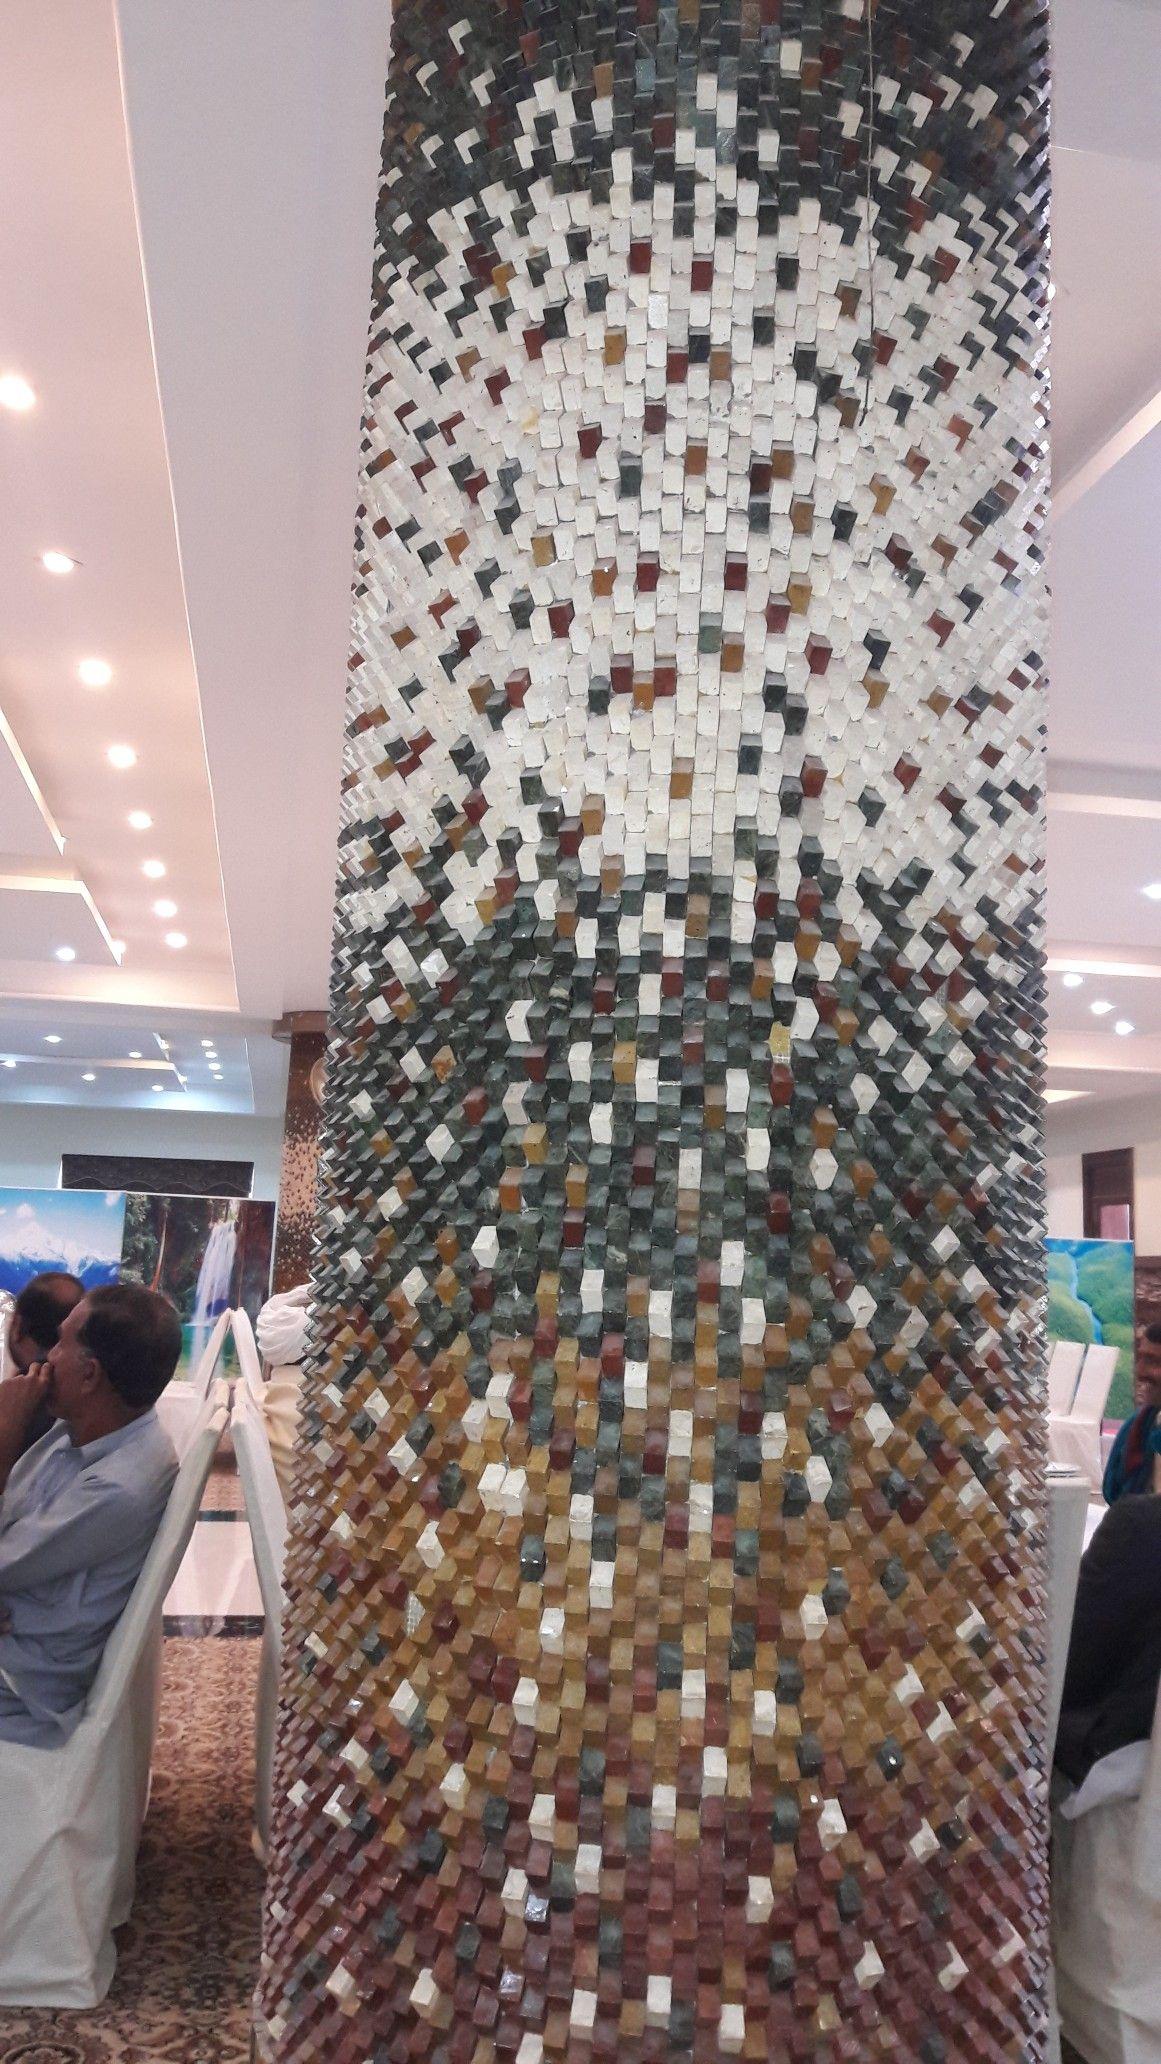 Pin by khan jee on tiles design column pinterest tile design and